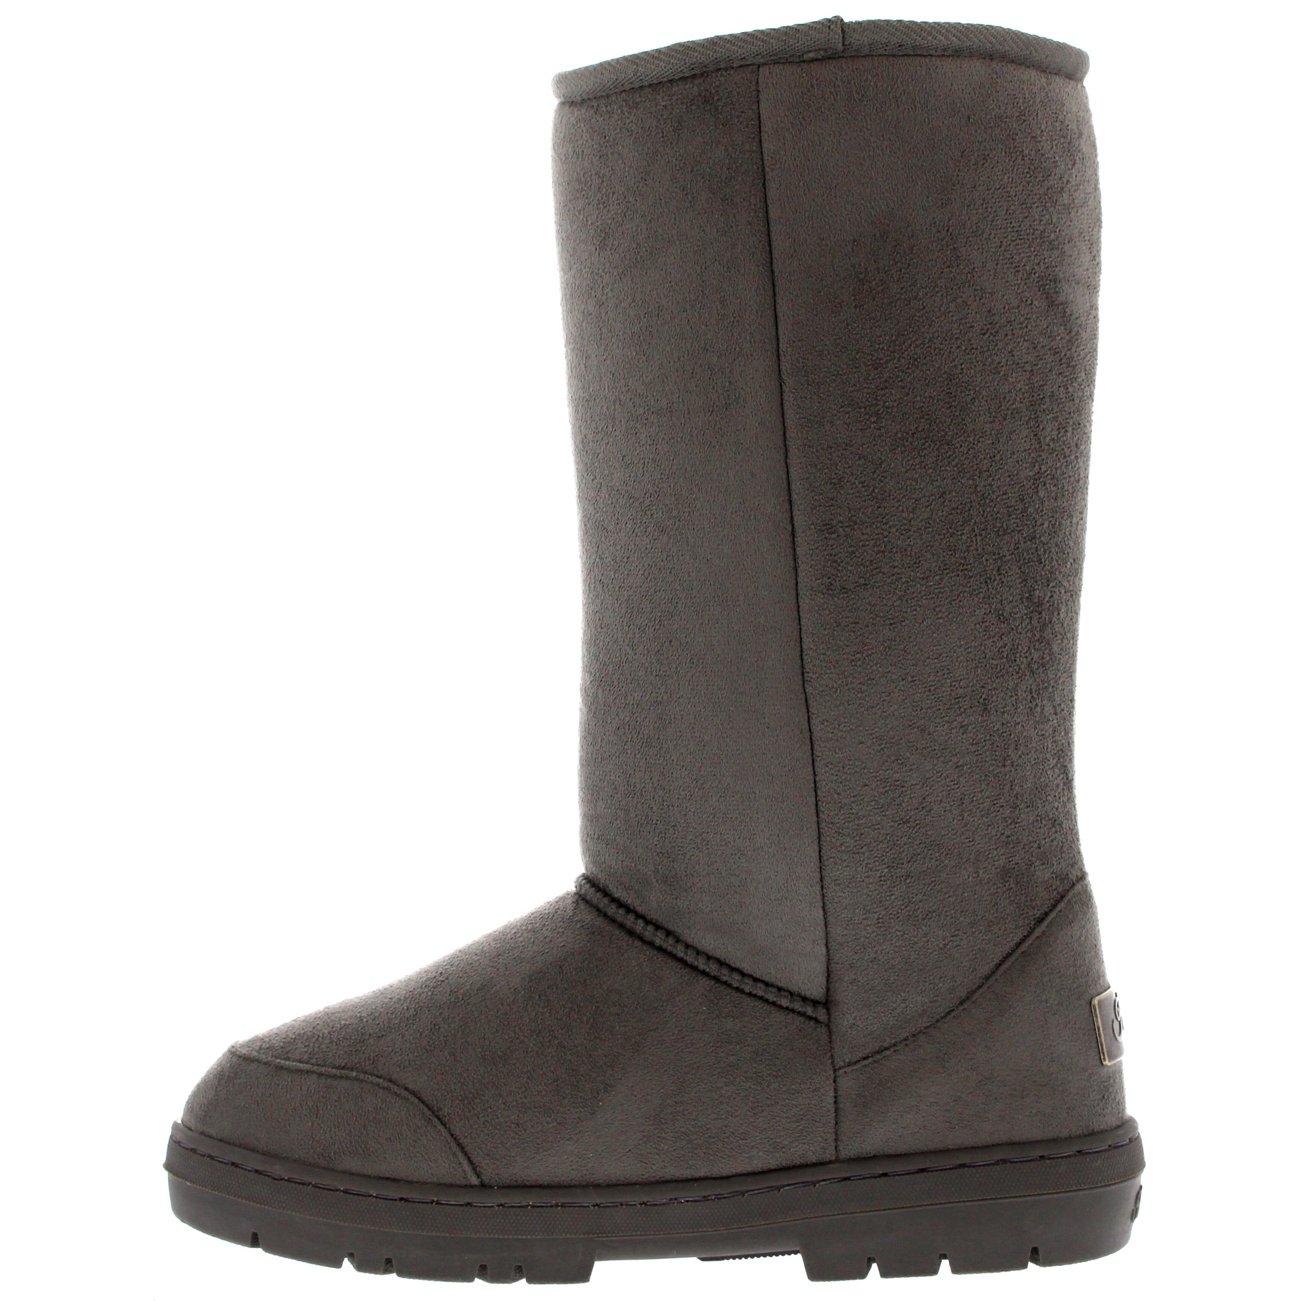 Stiefeletten Frauen Dunkelgrau Boots CLASSIC POMPOM